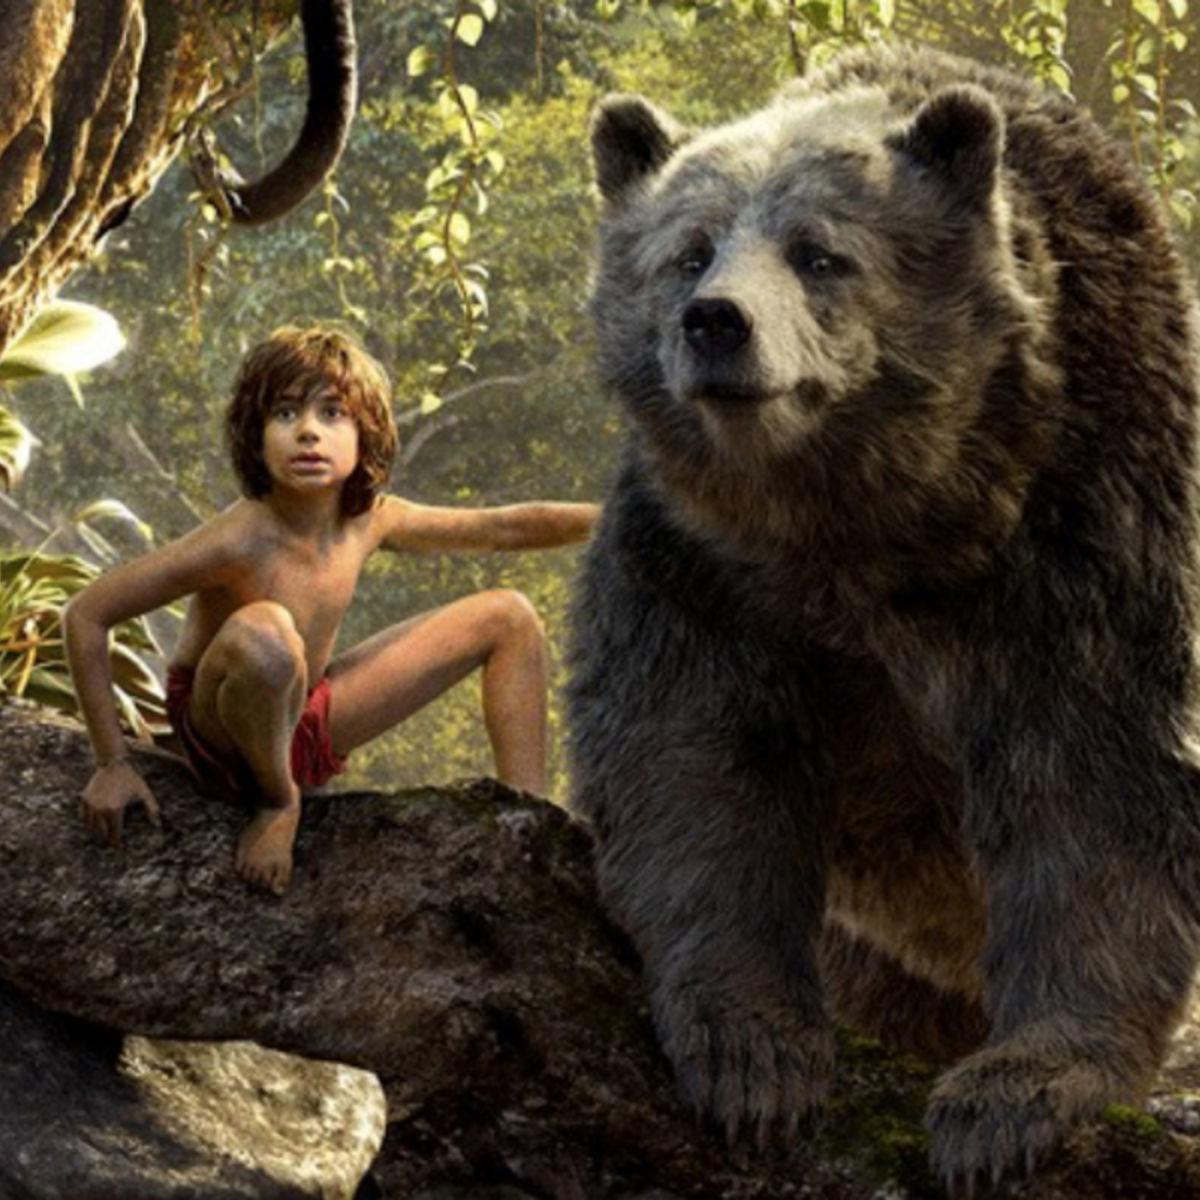 jungle-book-2016-posters-mowgli-baloo.jpg